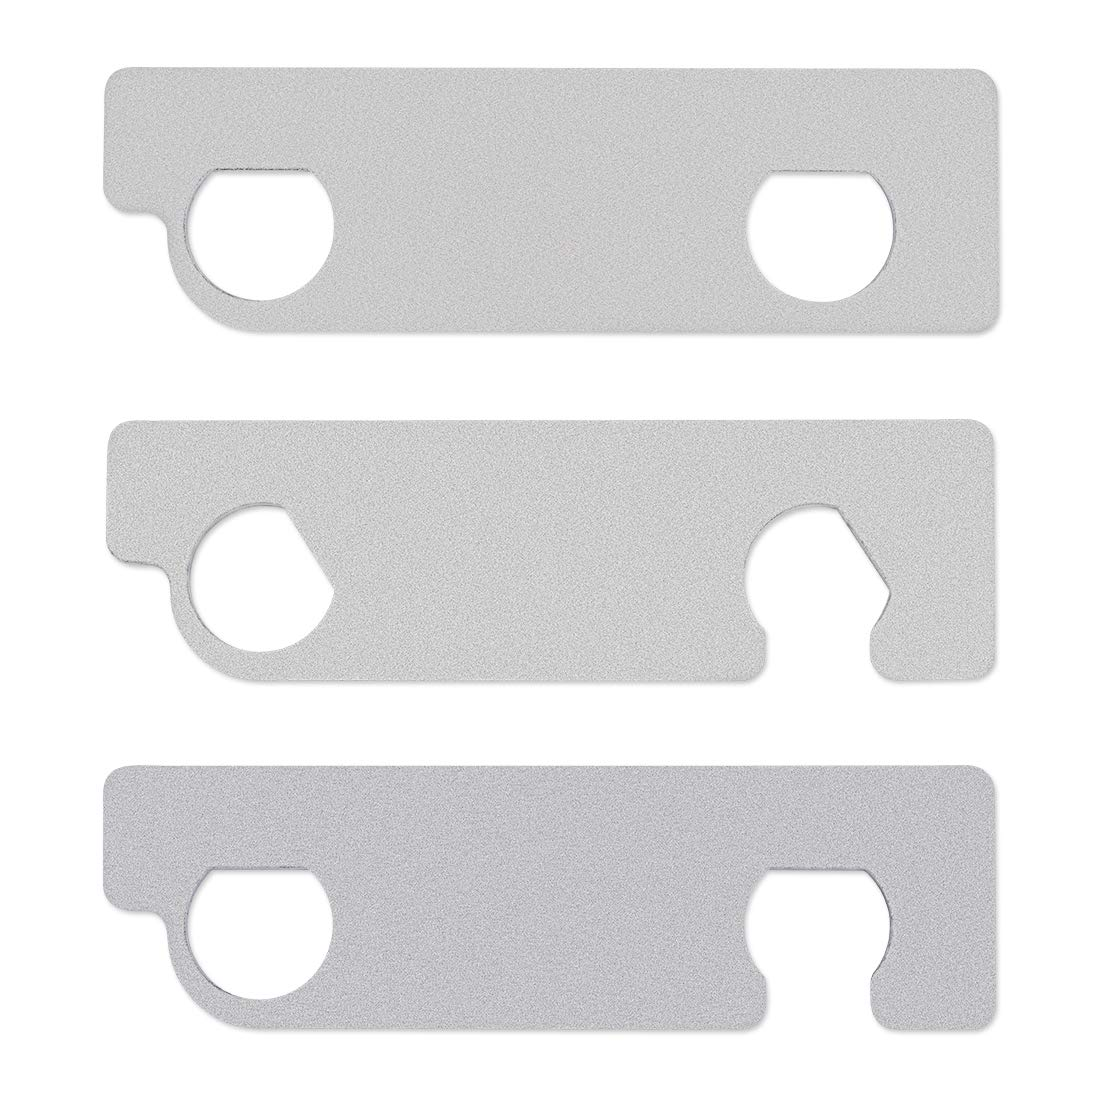 ANSITE Camshaft Retaining Tool EN48383 EN46105 for Vauxhall/Opel/Saab/Cadillac/Buick/Chevrolet/Pontiac